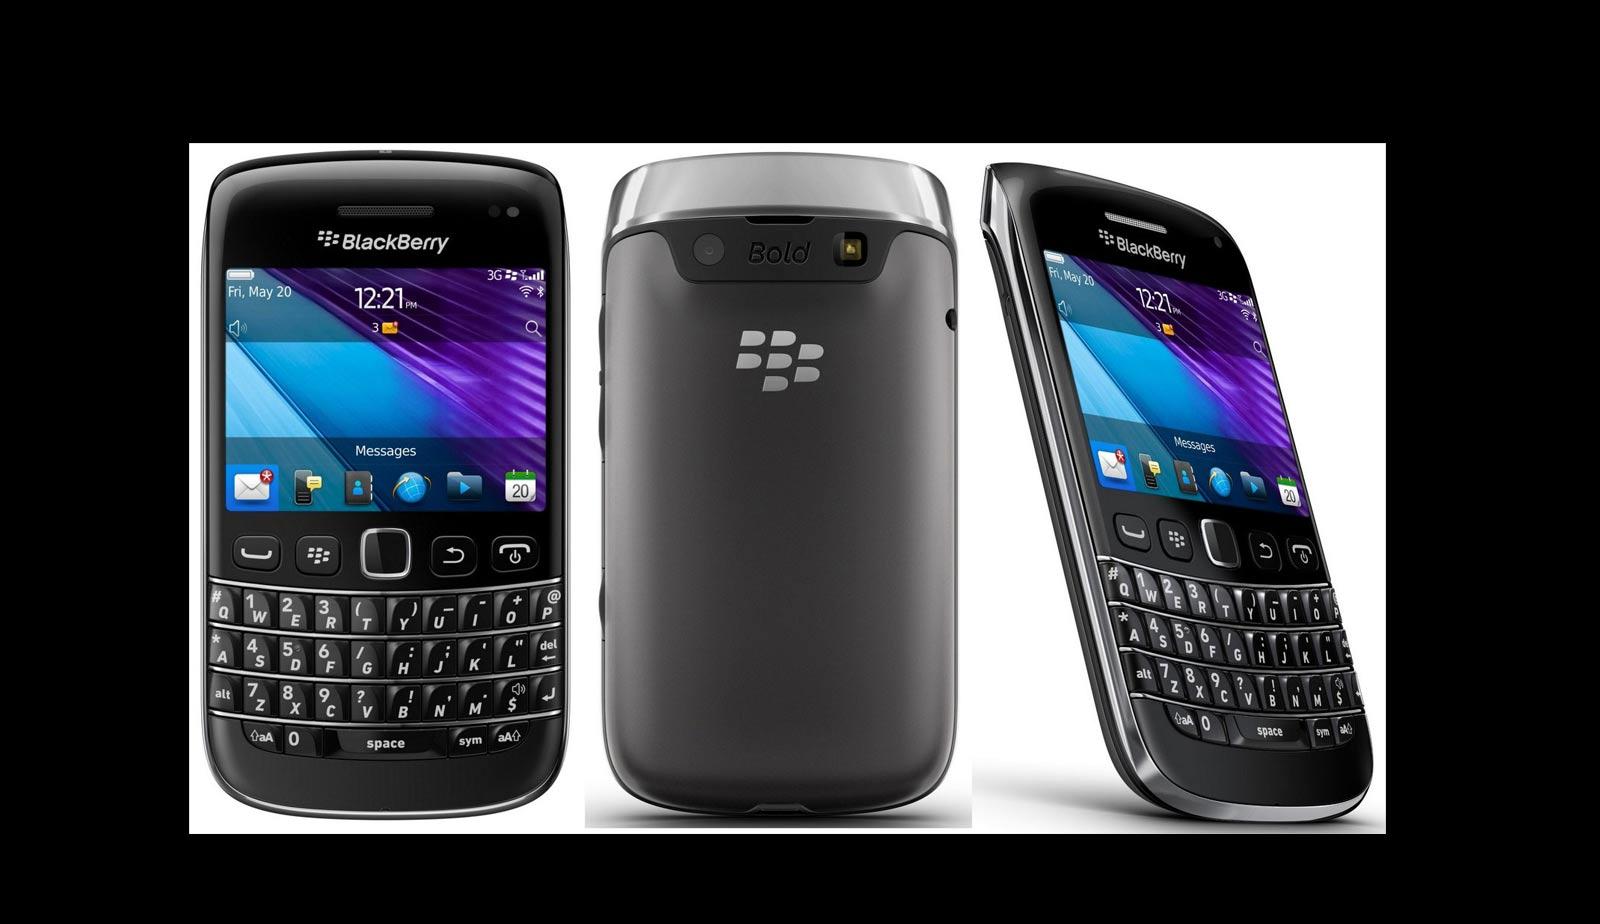 Blackberry deja atrás su icónico diseño